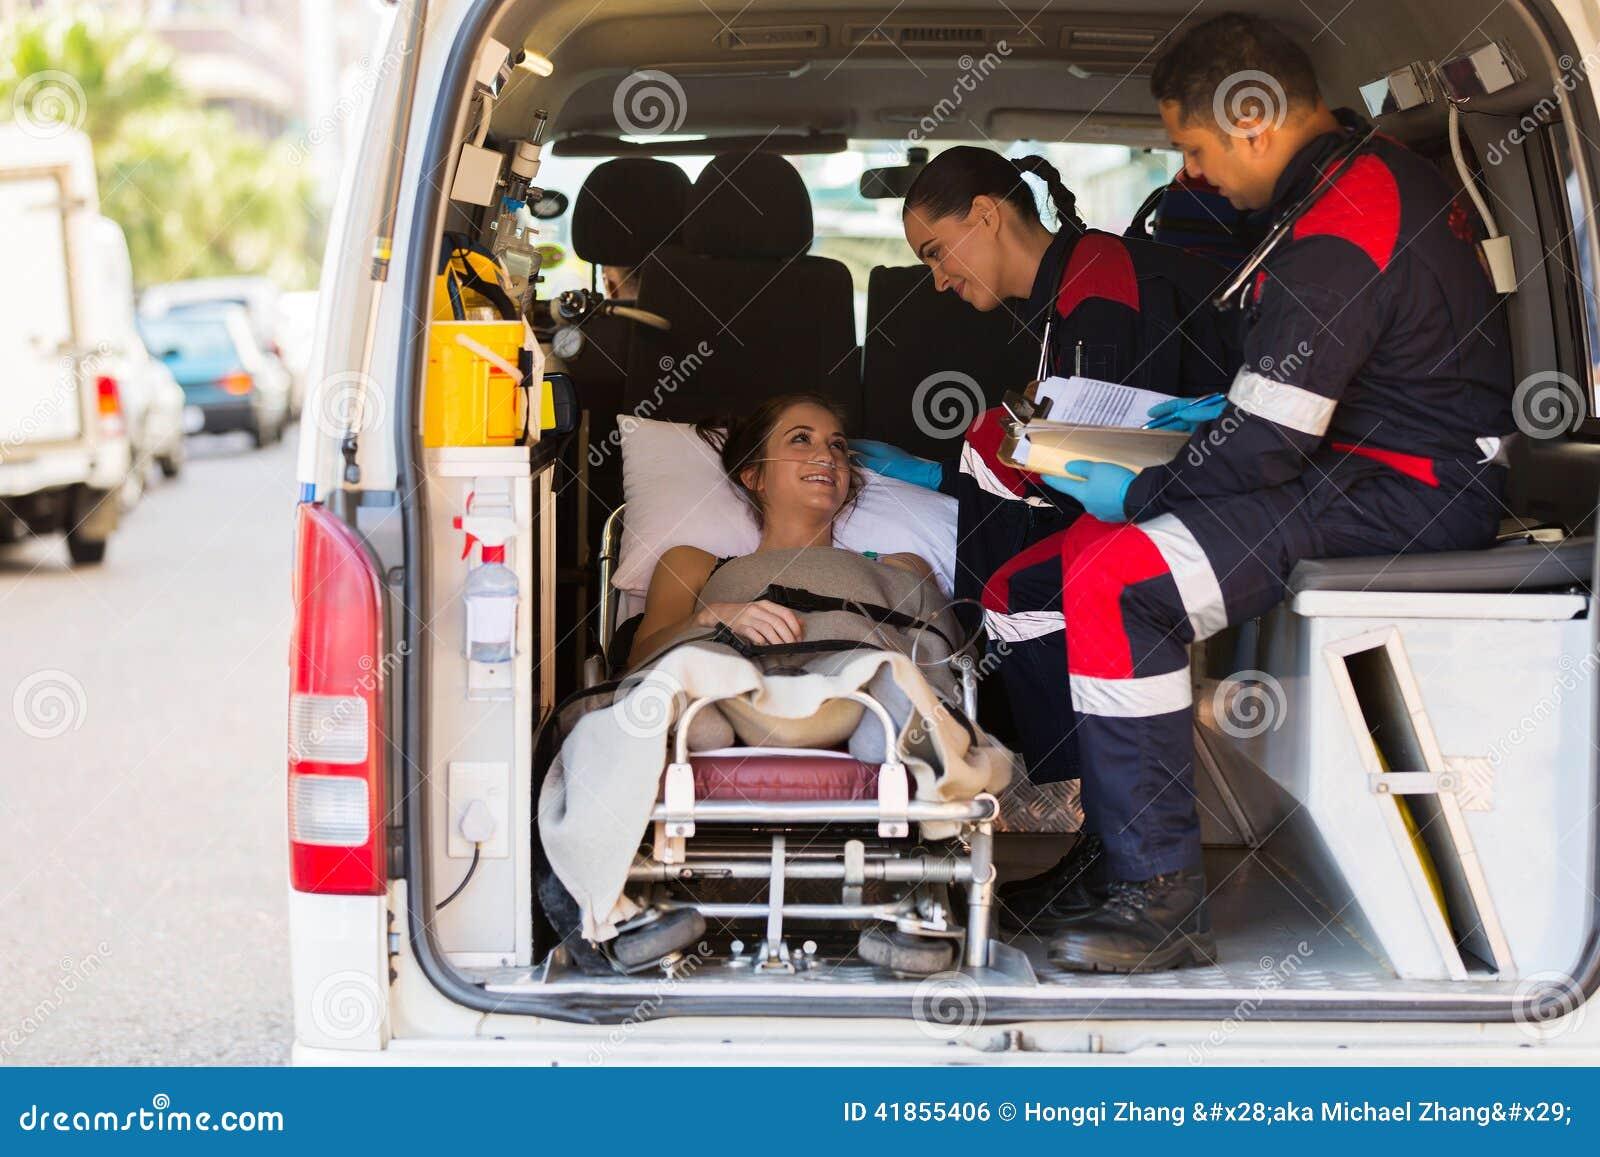 Paramedic patient ambulance